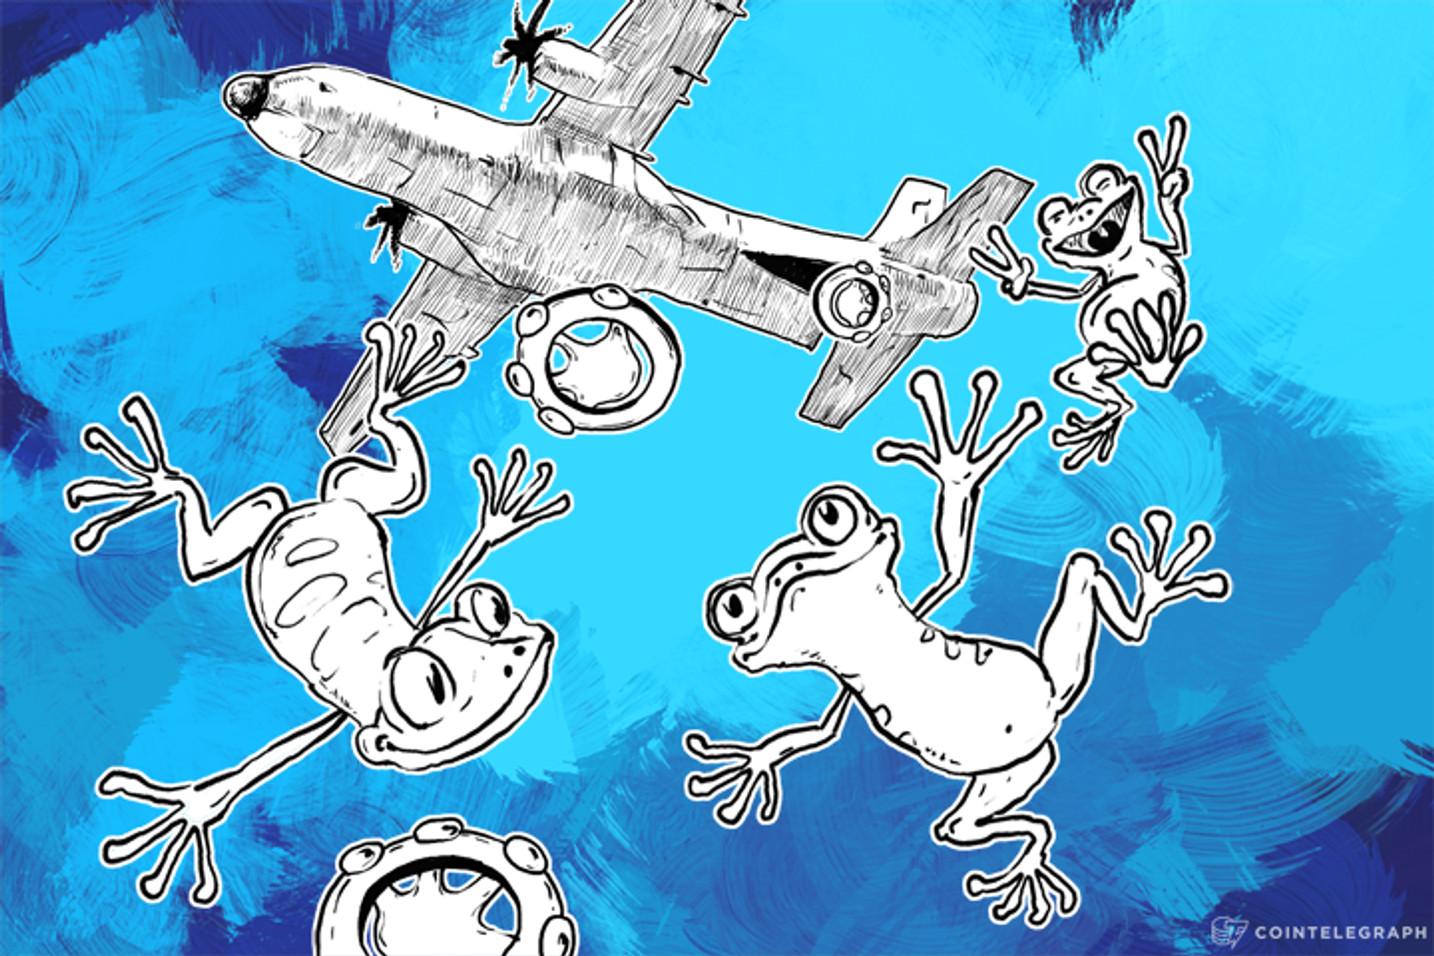 Ribbit.me: World's First Blockchain-Based Rewards Program 'A Tool' to Mainstream Bitcoin